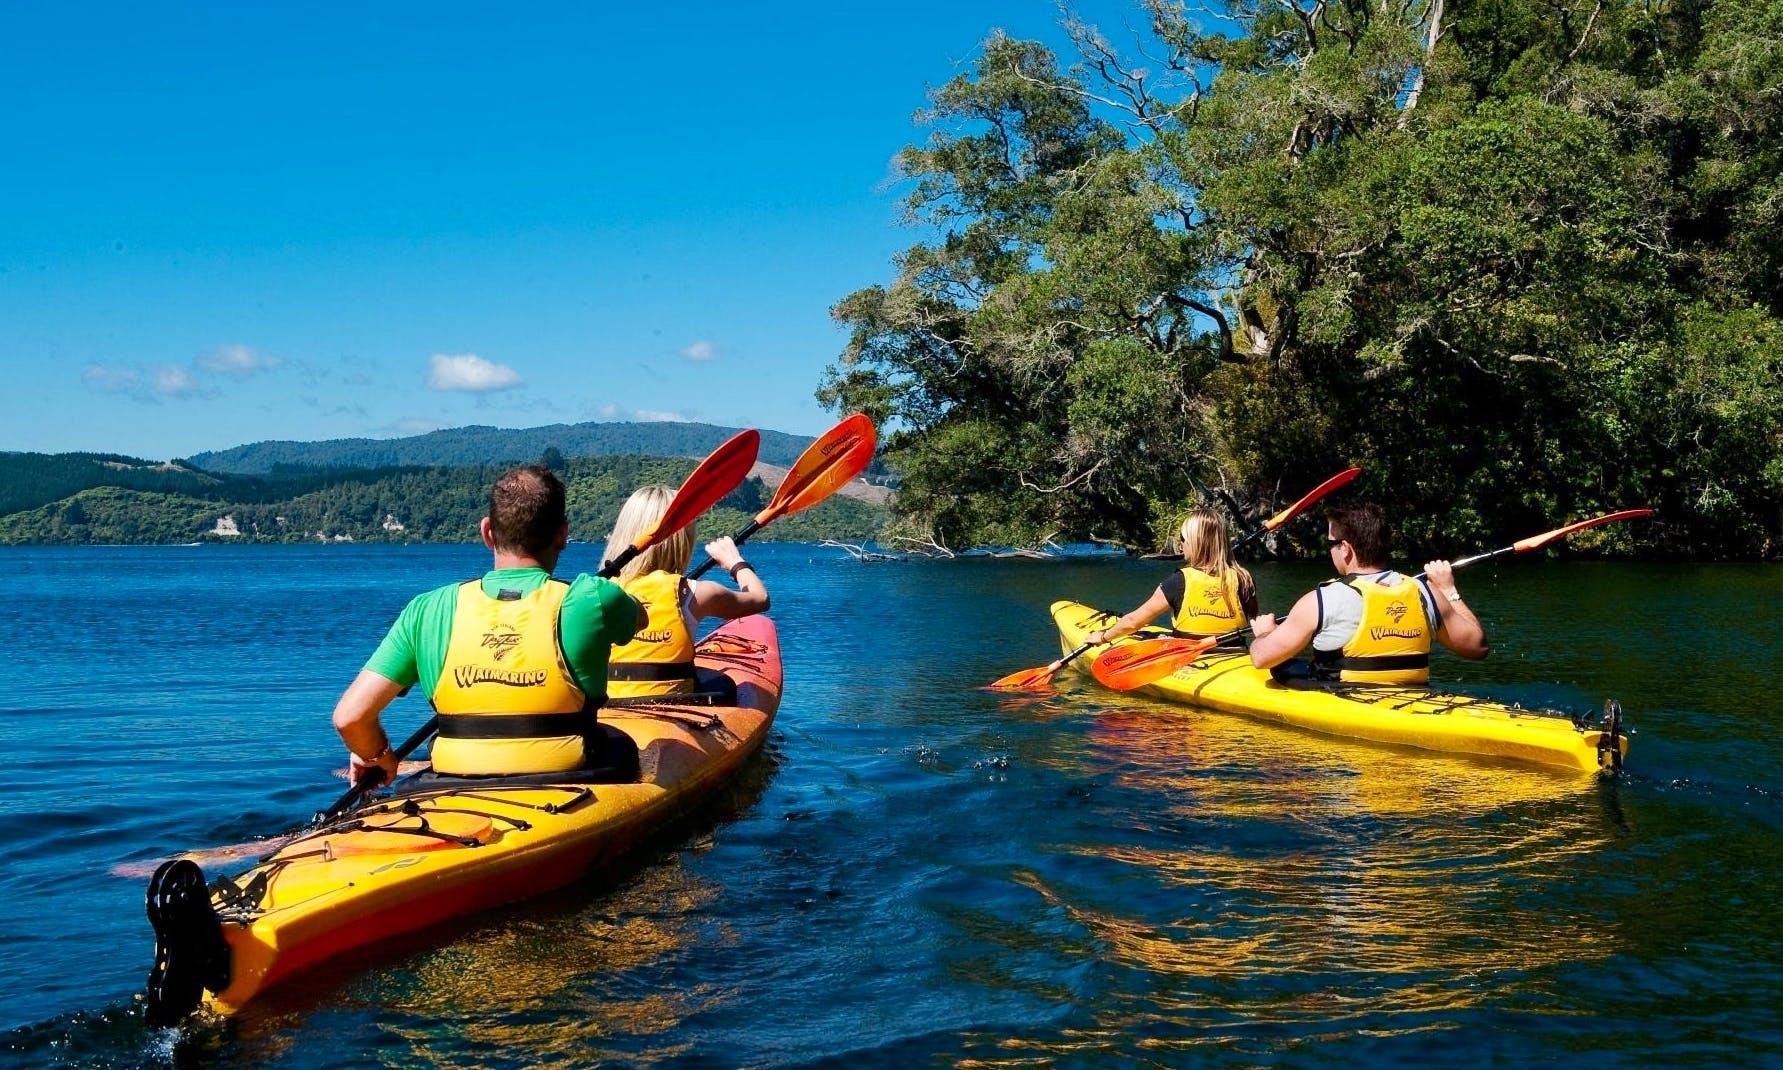 2-seater Kayak Tours & Rentals in Tauranga, New Zealand